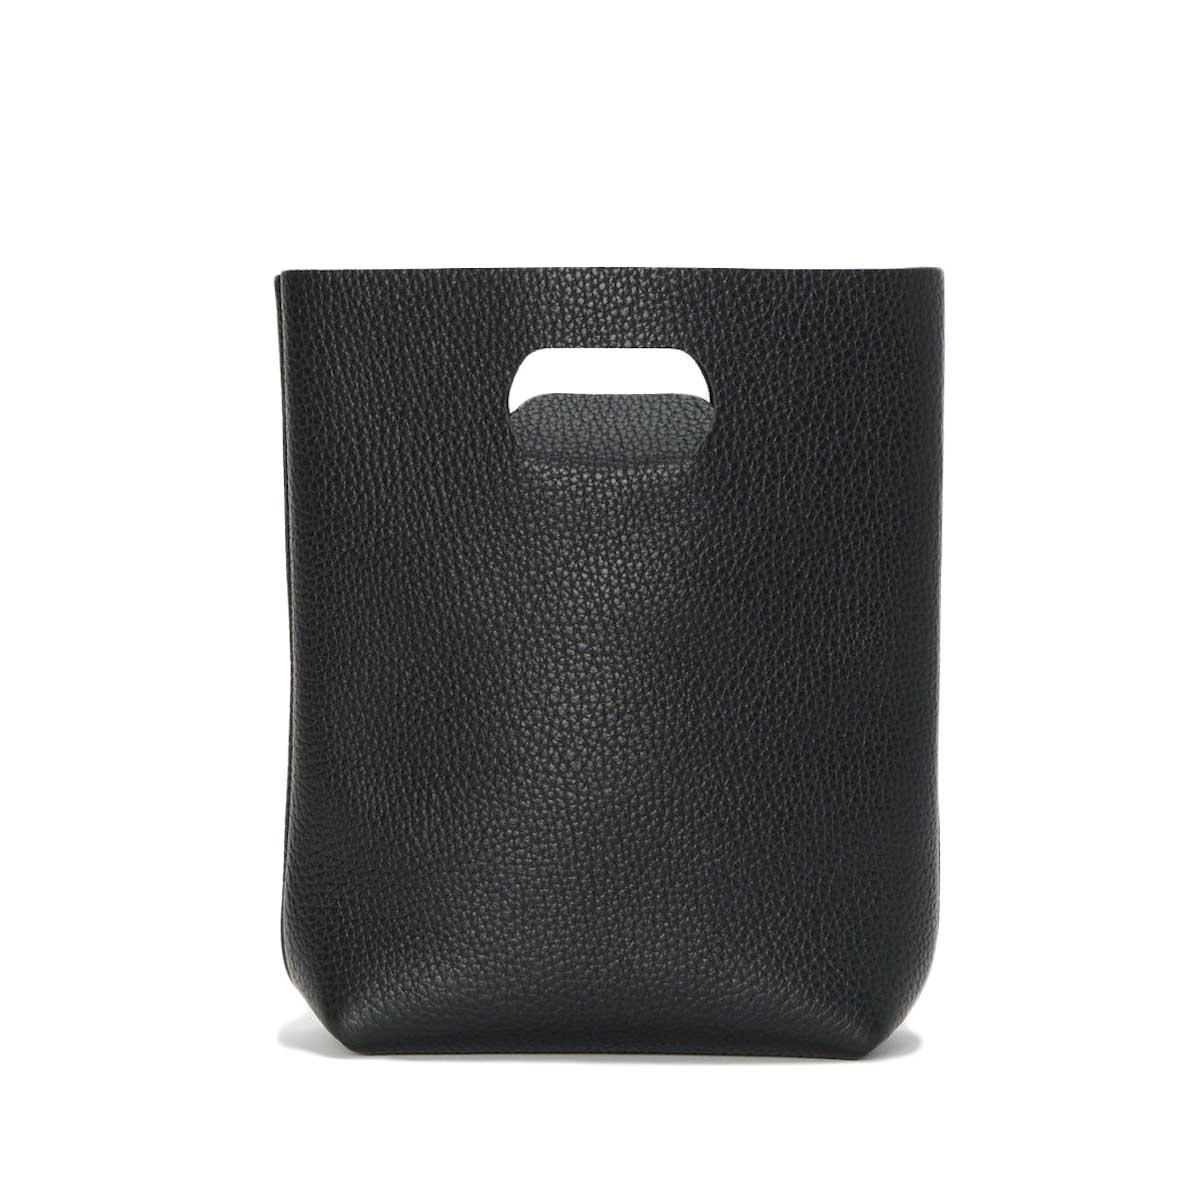 Hender Scheme / not eco bag small (Black)